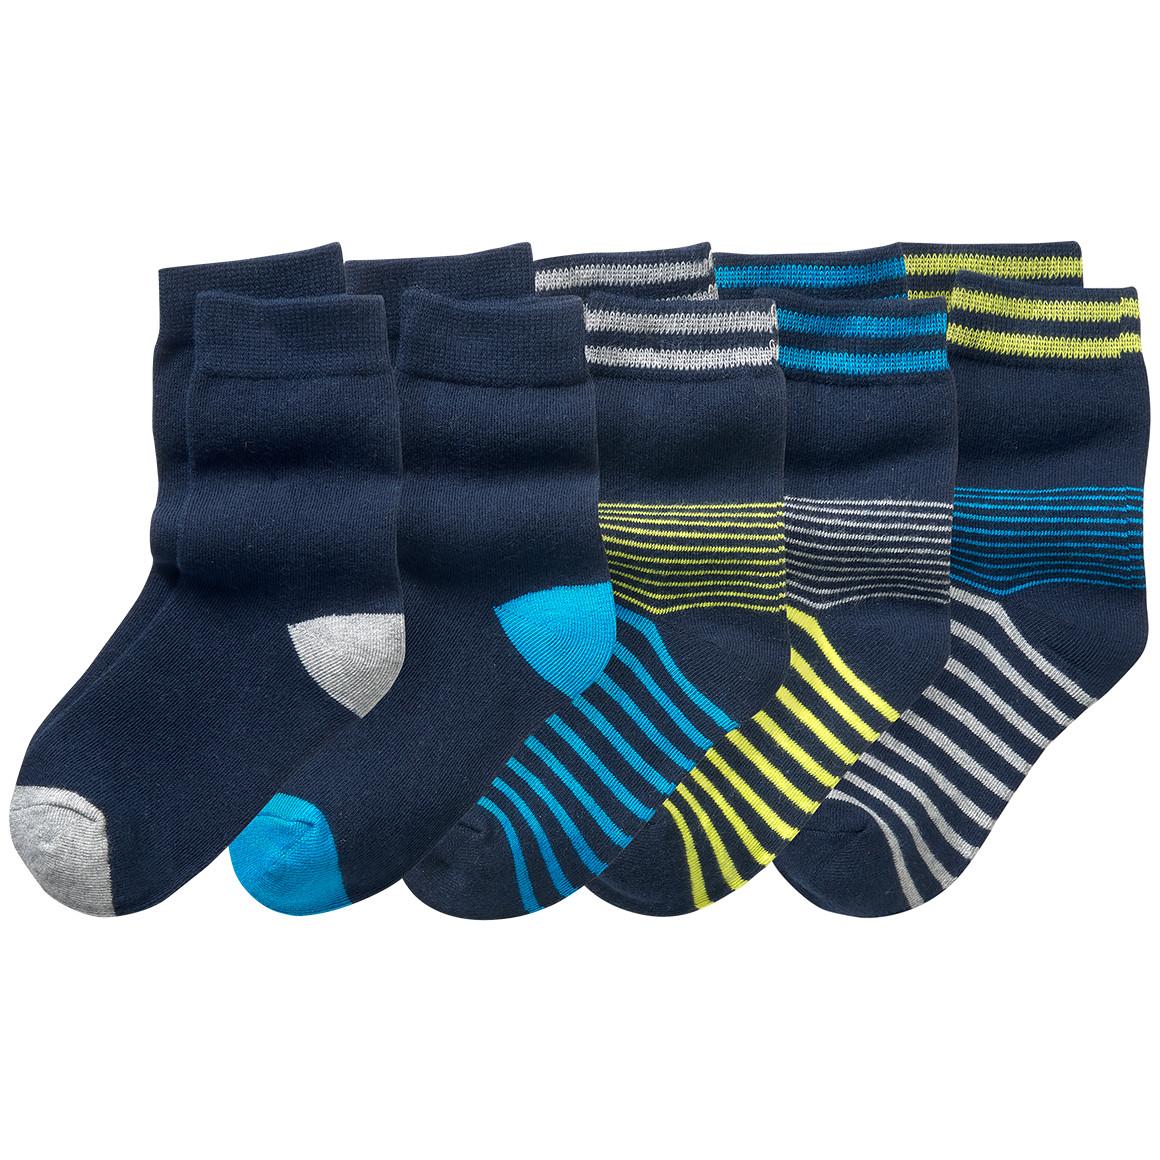 5 Paar Jungen Socken